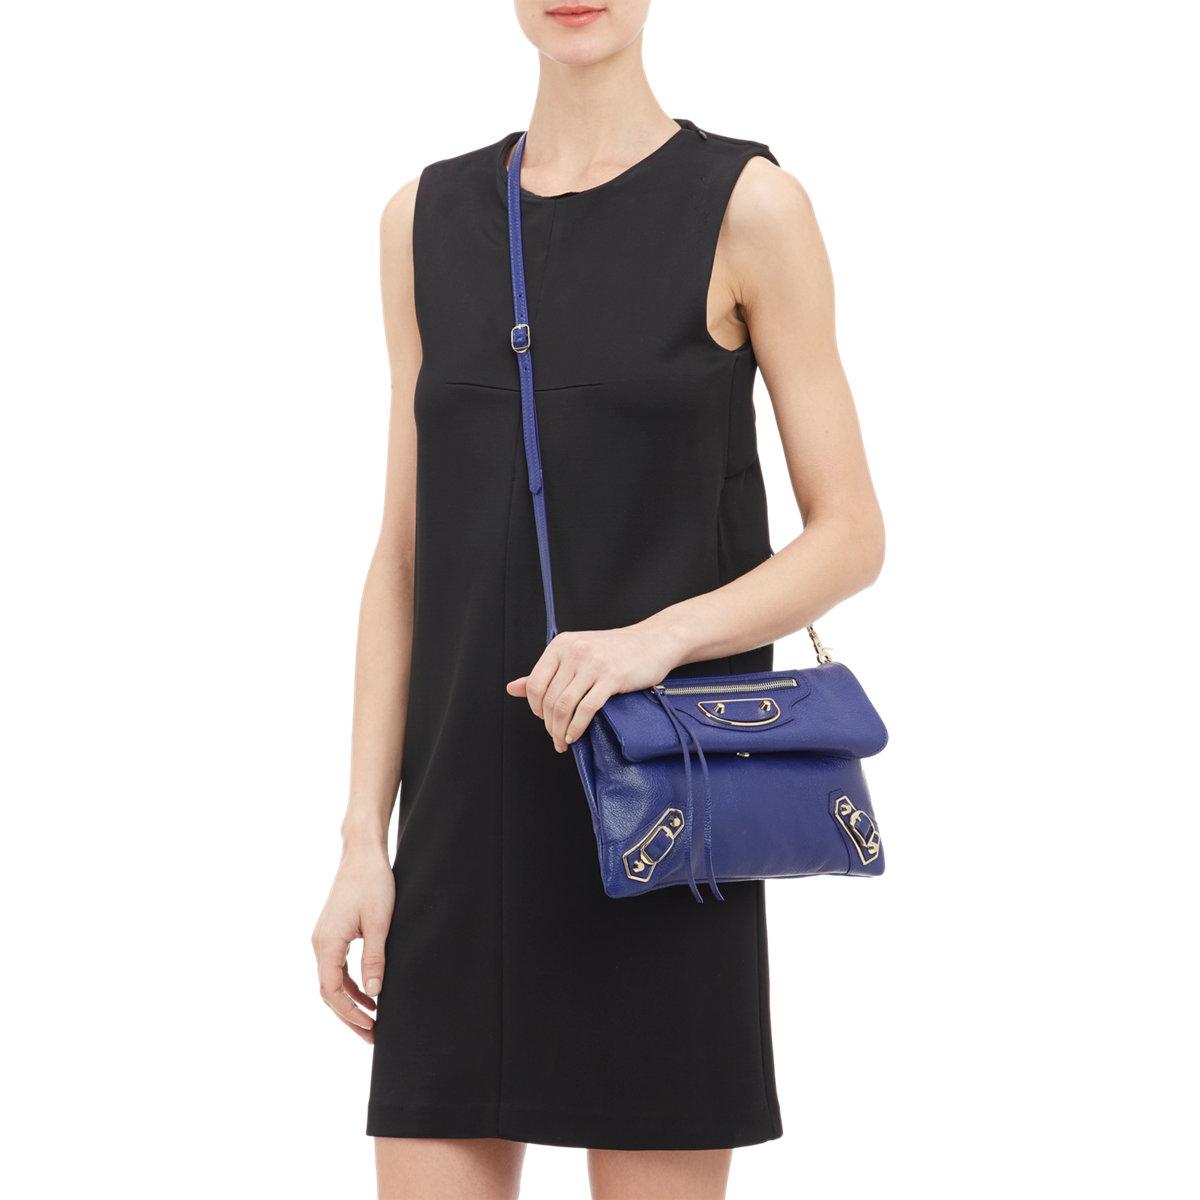 replica chloe classic 80597 ladies handbag lambskin